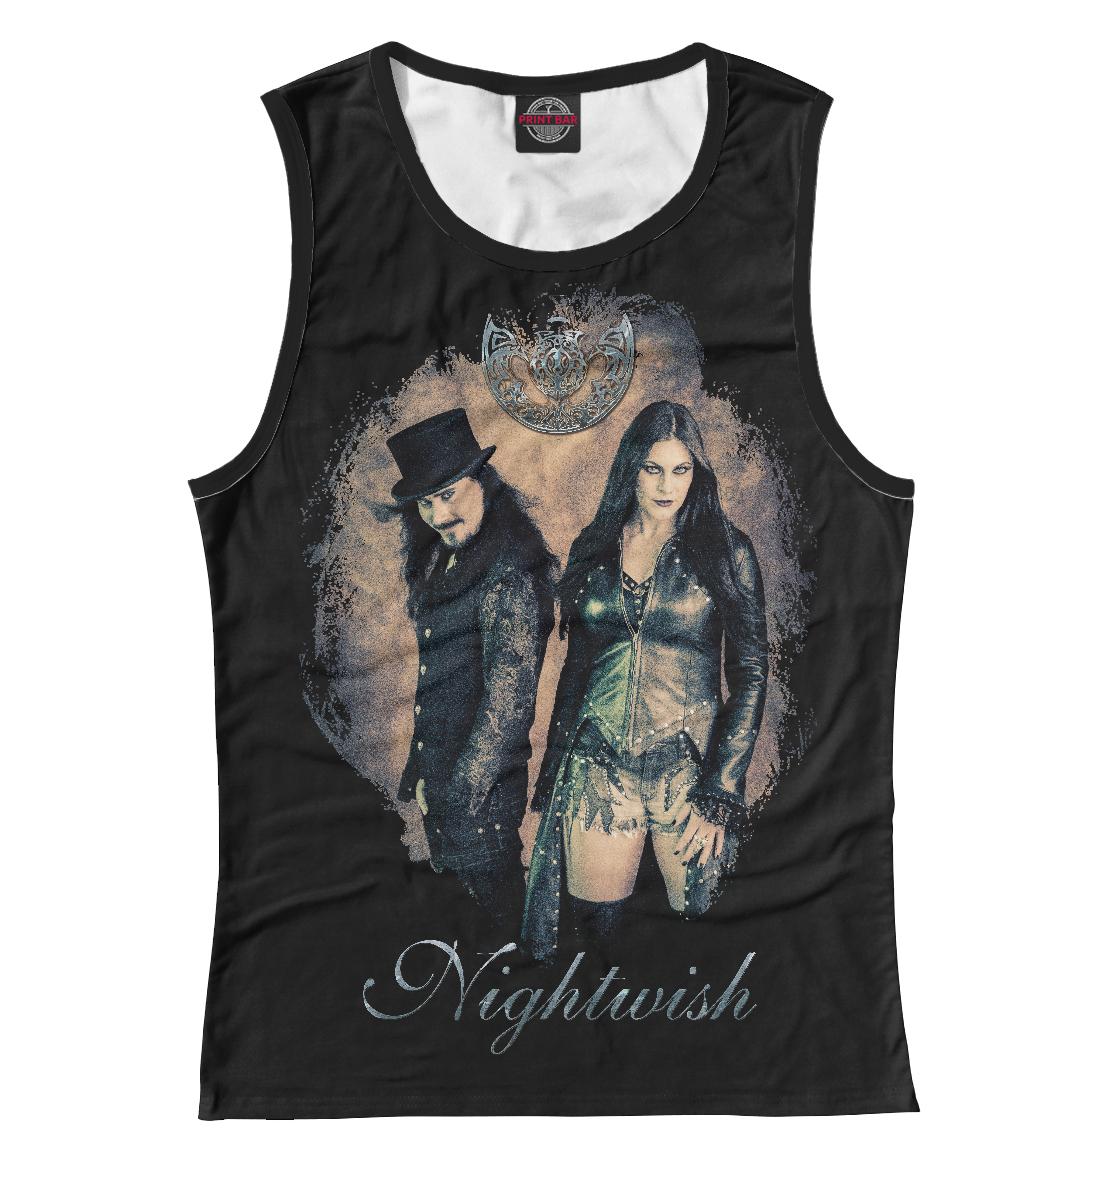 Купить Nightwish, Printbar, Майки, NTH-664914-may-1